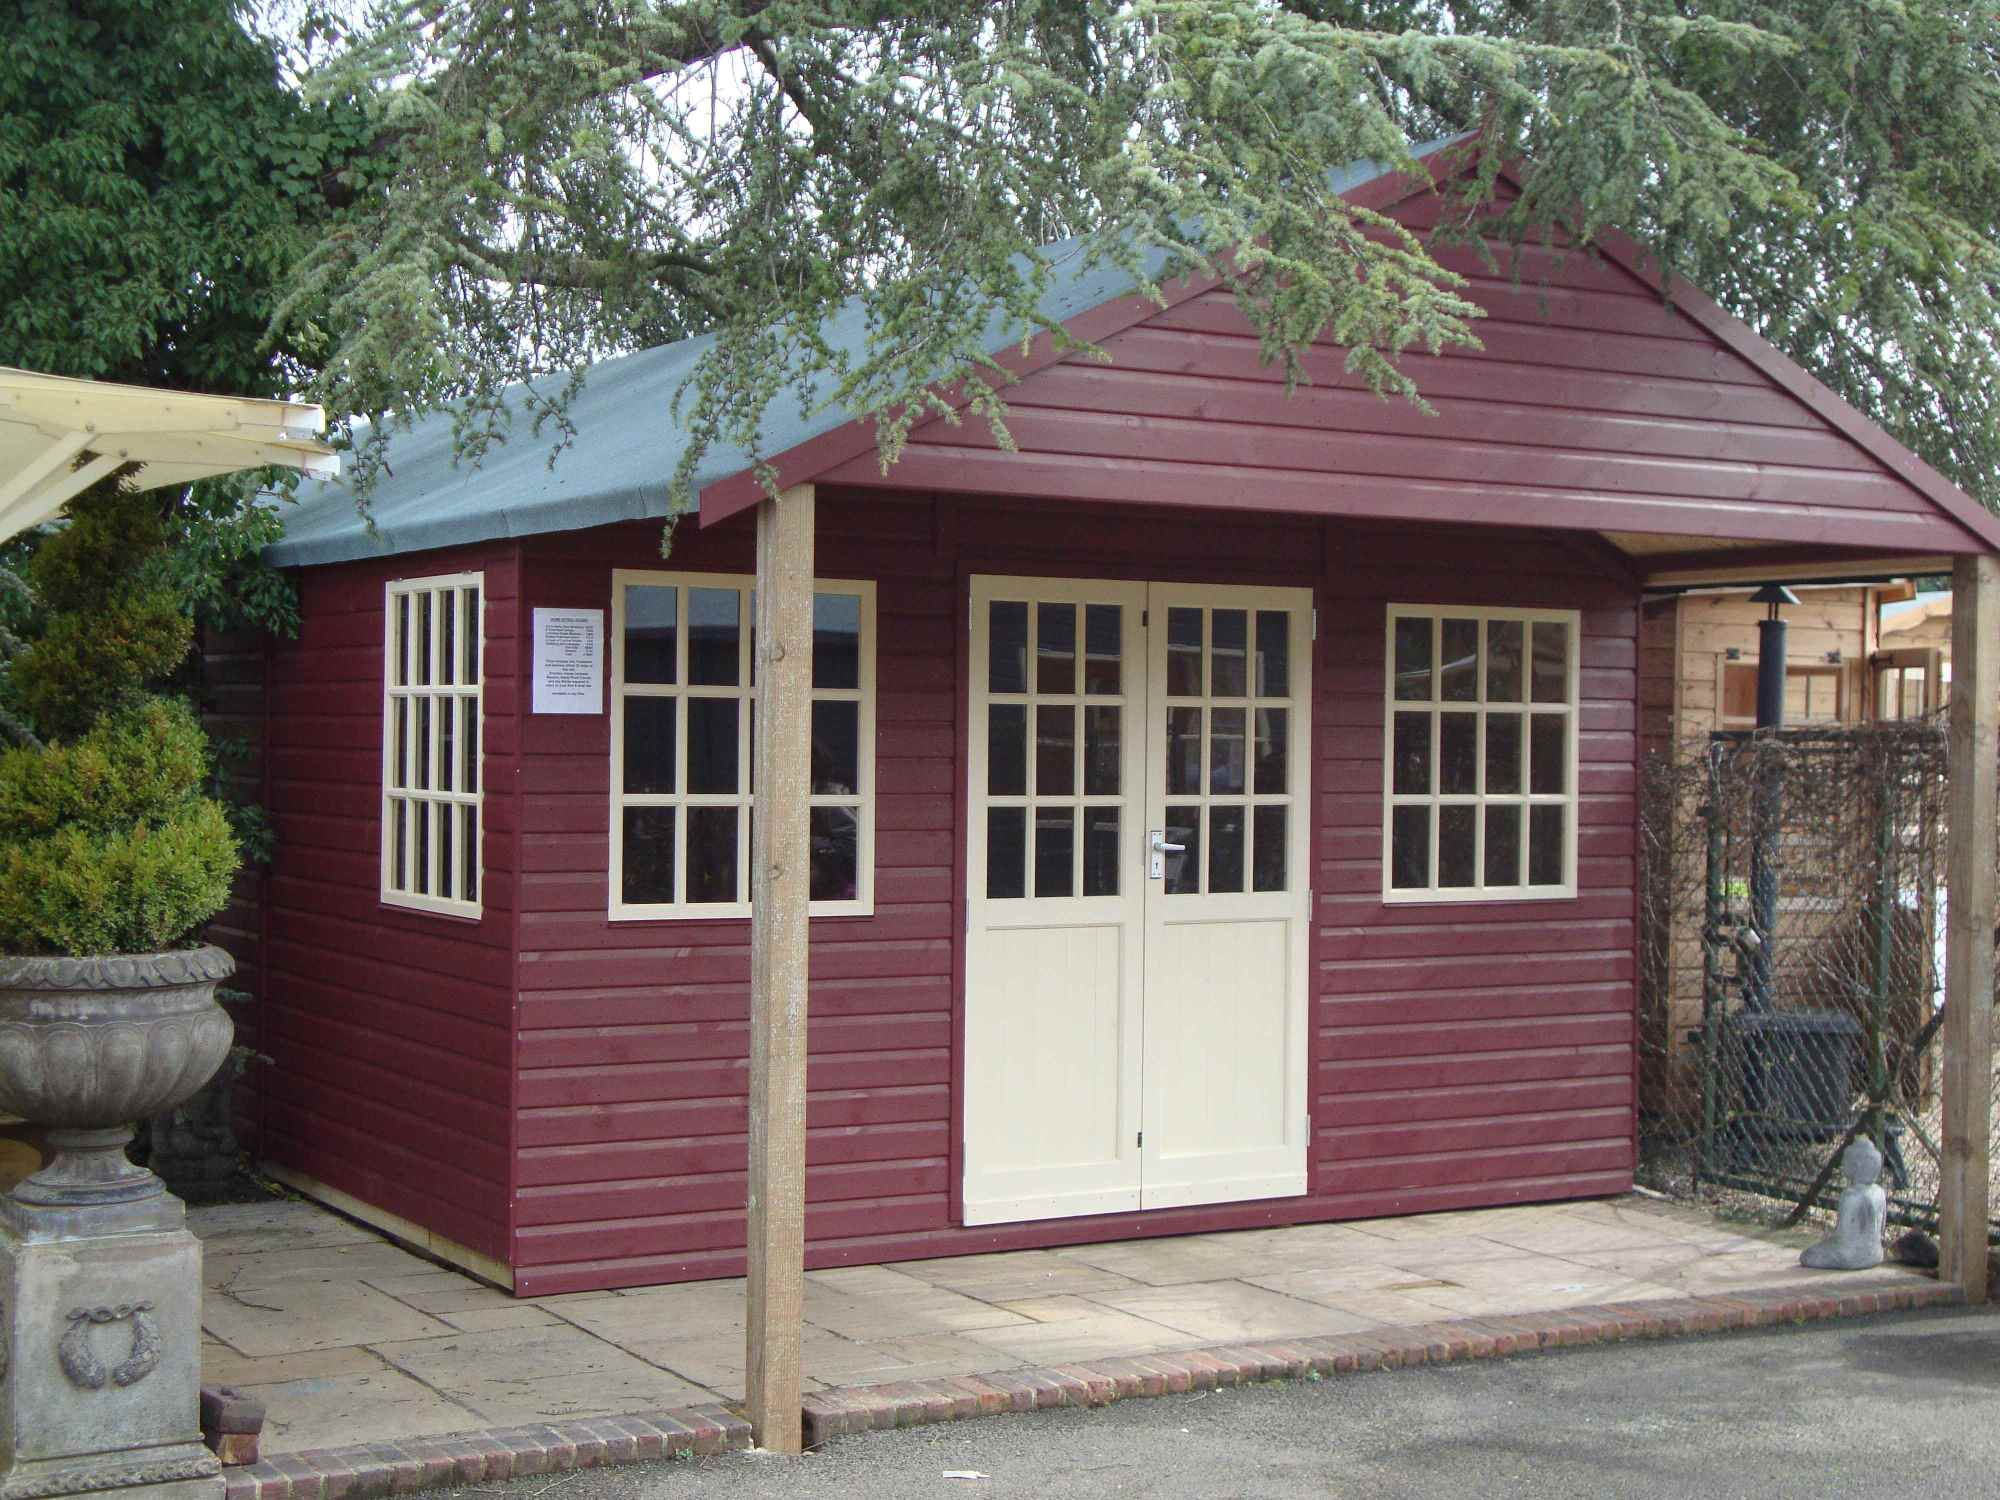 Garden Sheds Ripley mb garden buildings, summer houses, play houses, garden sheds